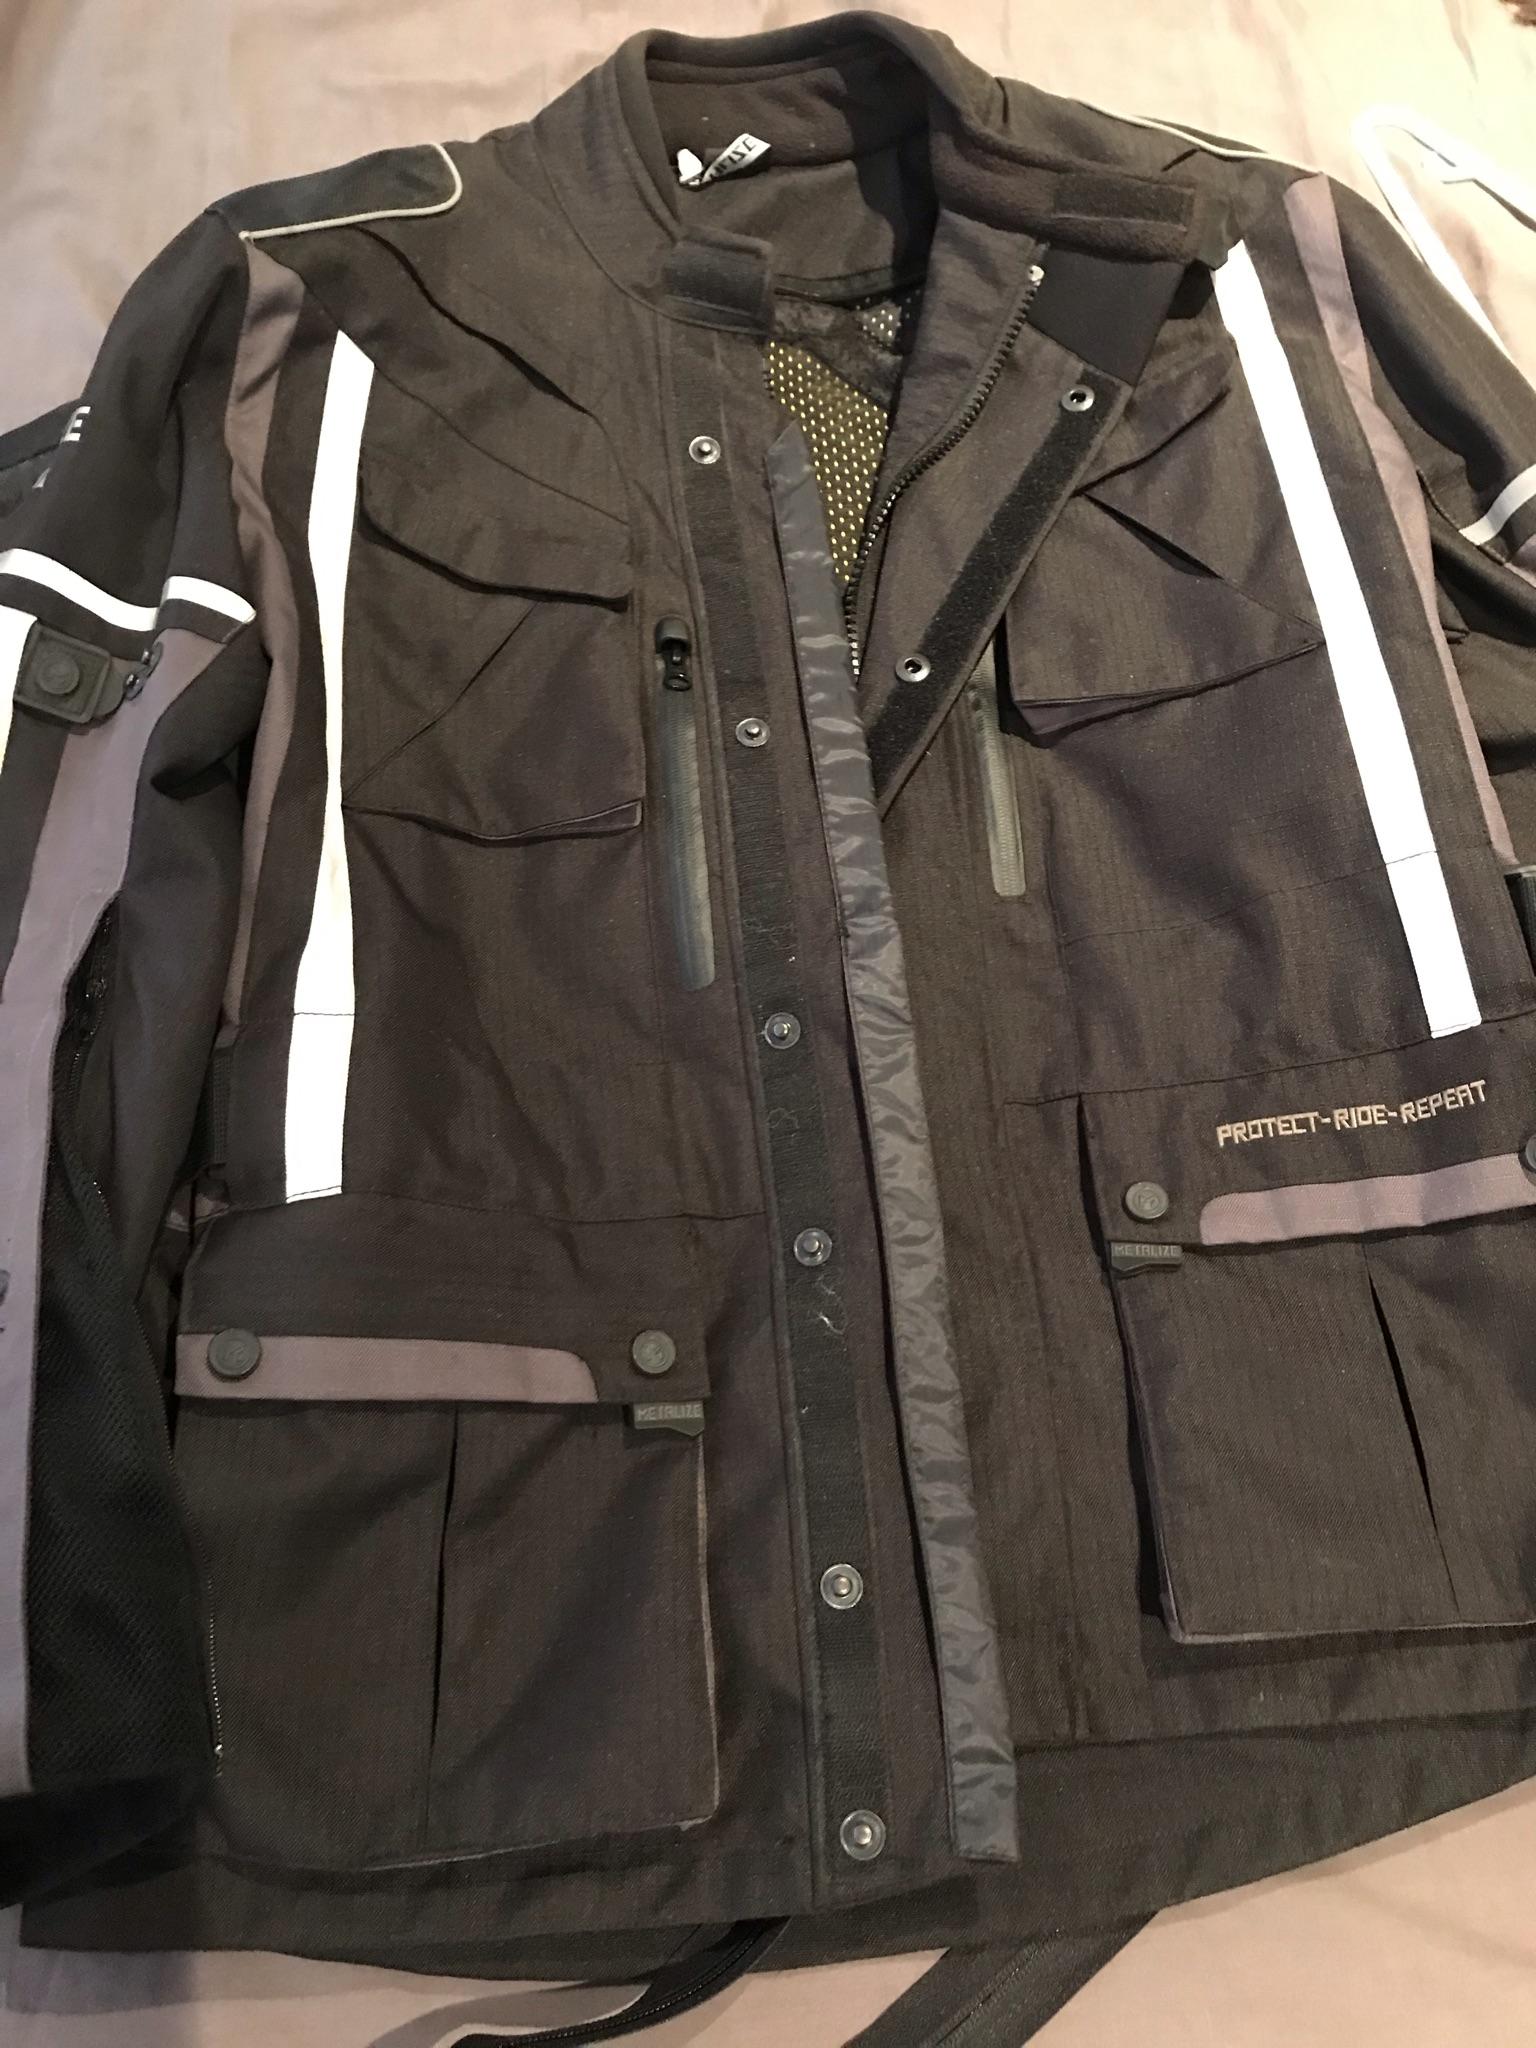 Metalize Bike Jacket